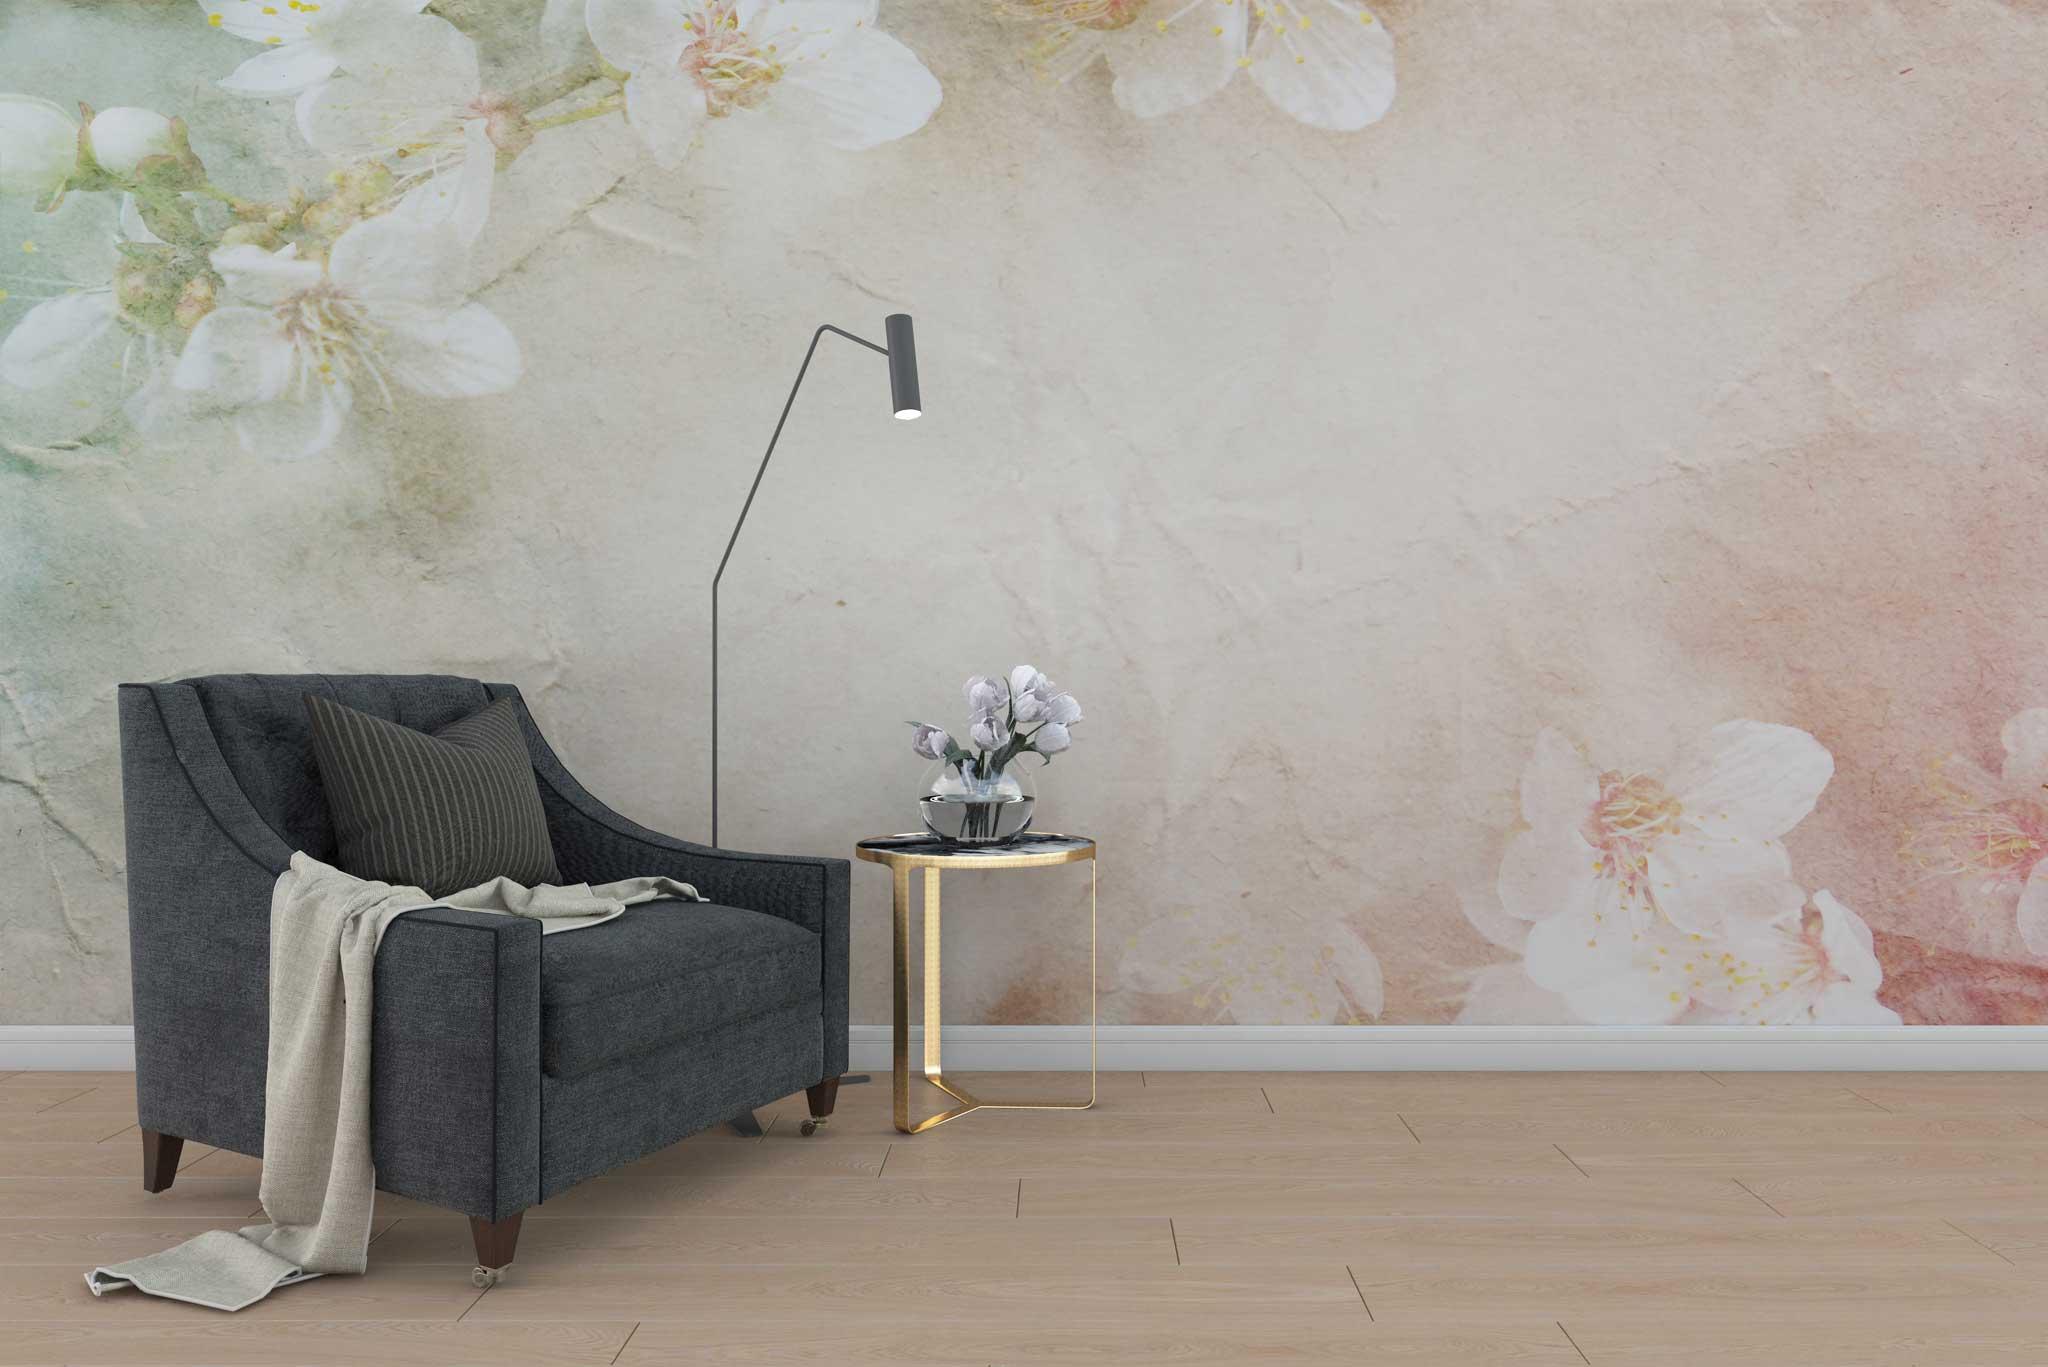 https://daringprints.ro/wp-content/uploads/2020/12/tapet-fototapet-special-personalizat-customizabil-comanda-bucuresti-daring-prints-model-floral-flori-cires-stil-vintage-romantic-pastel.jpg